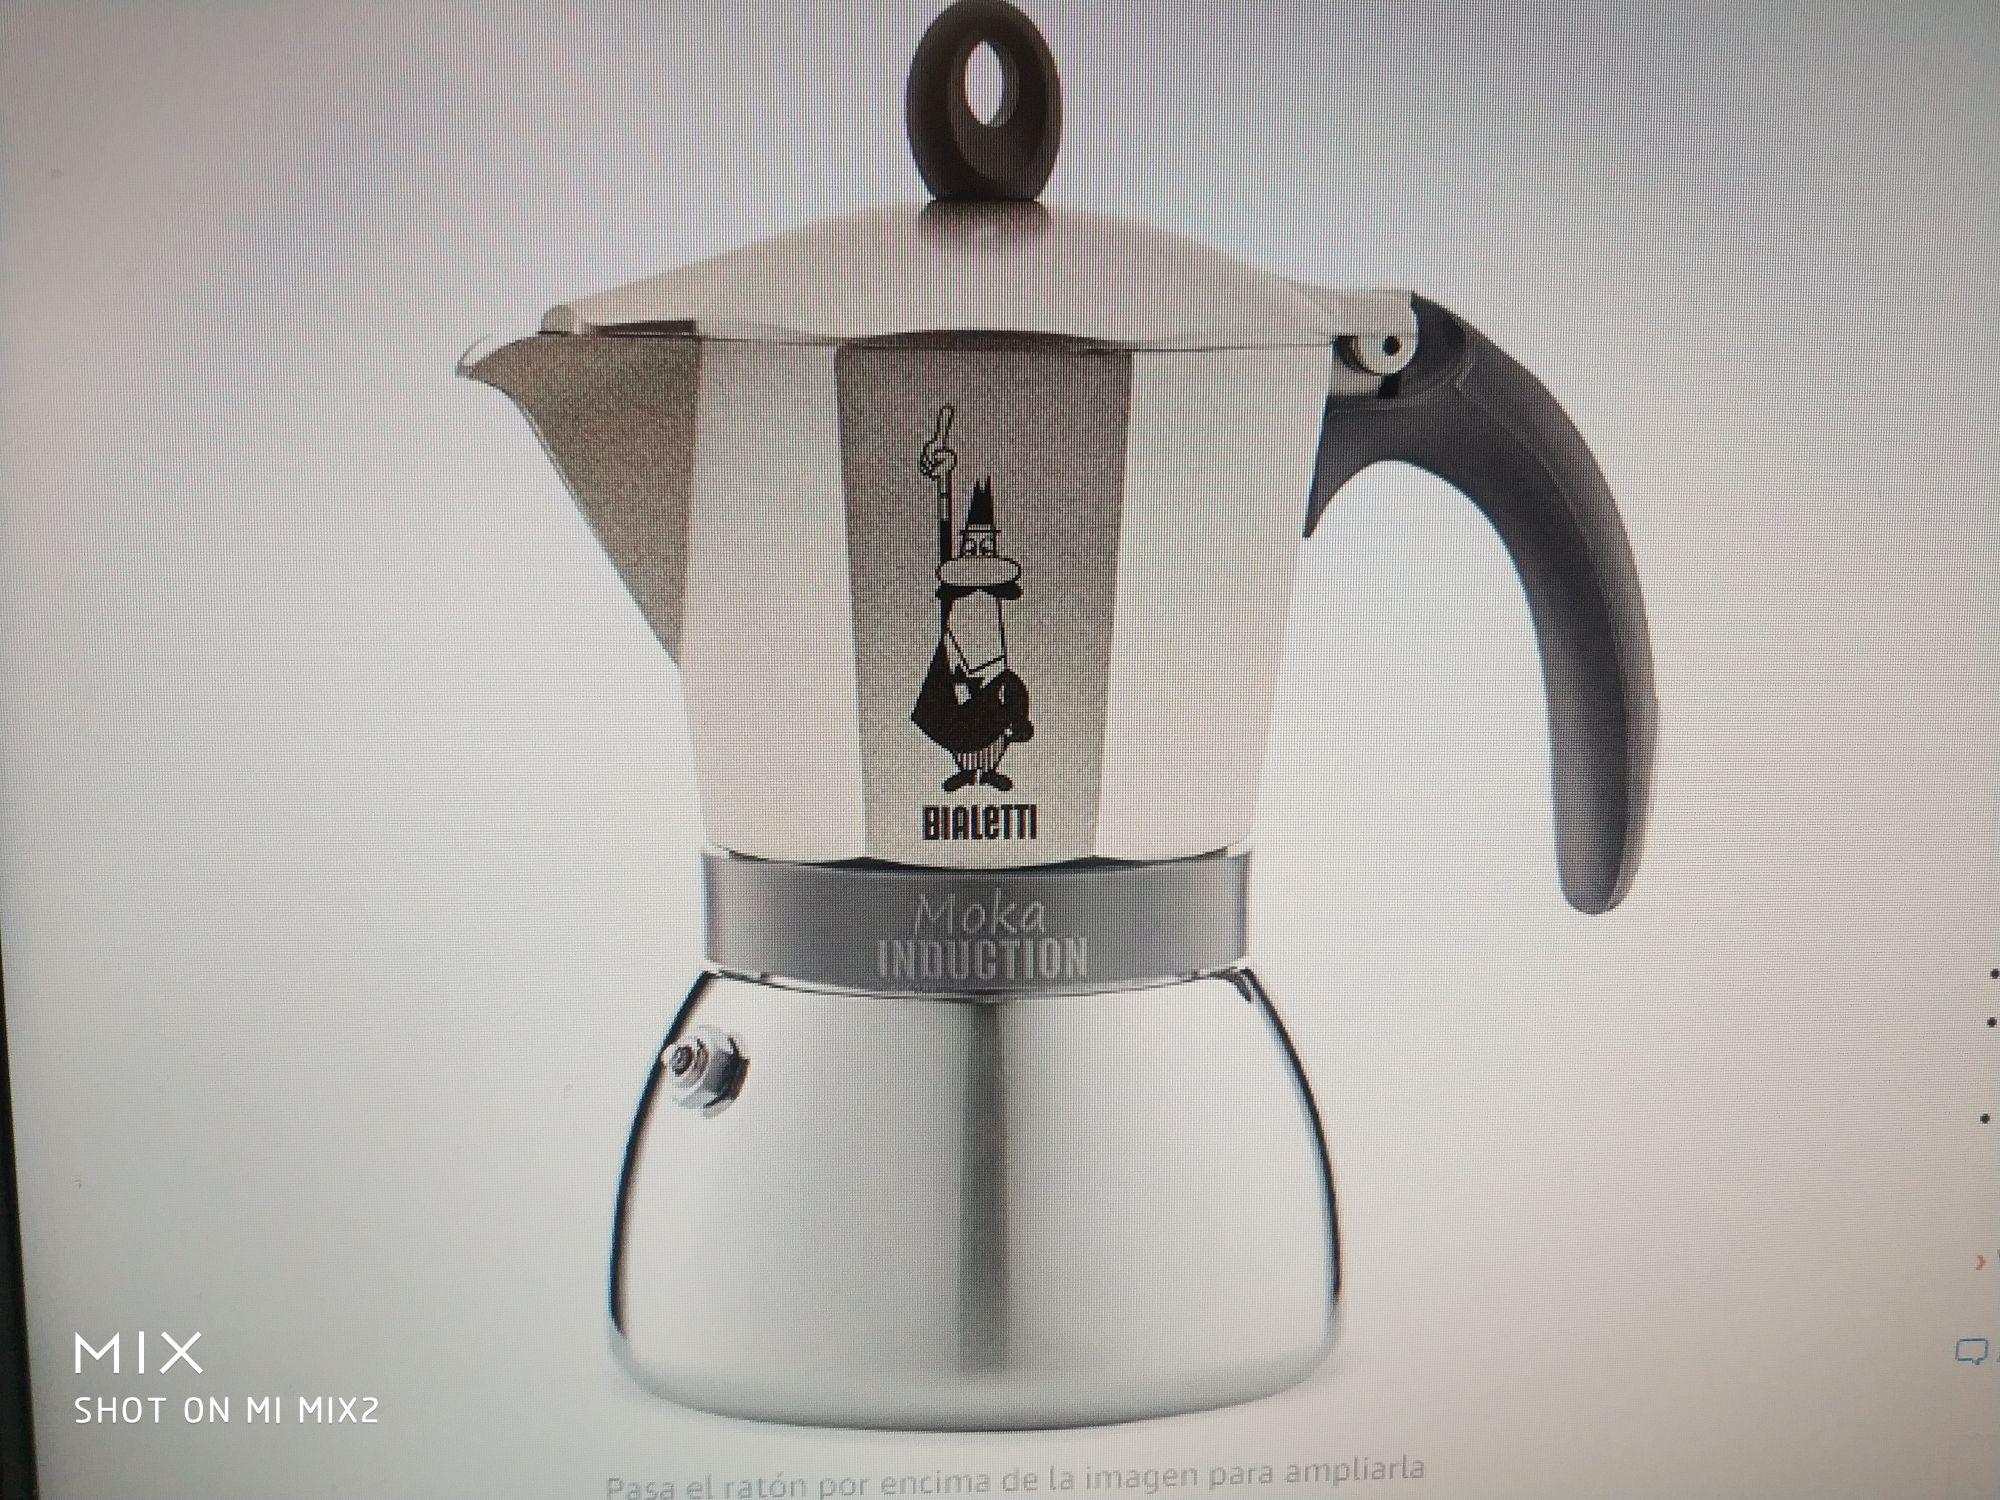 (Reacondicionada) Bialetti Moka Induction, cafetera con Base de Acero para inducción, Color Oro 6 Tazas